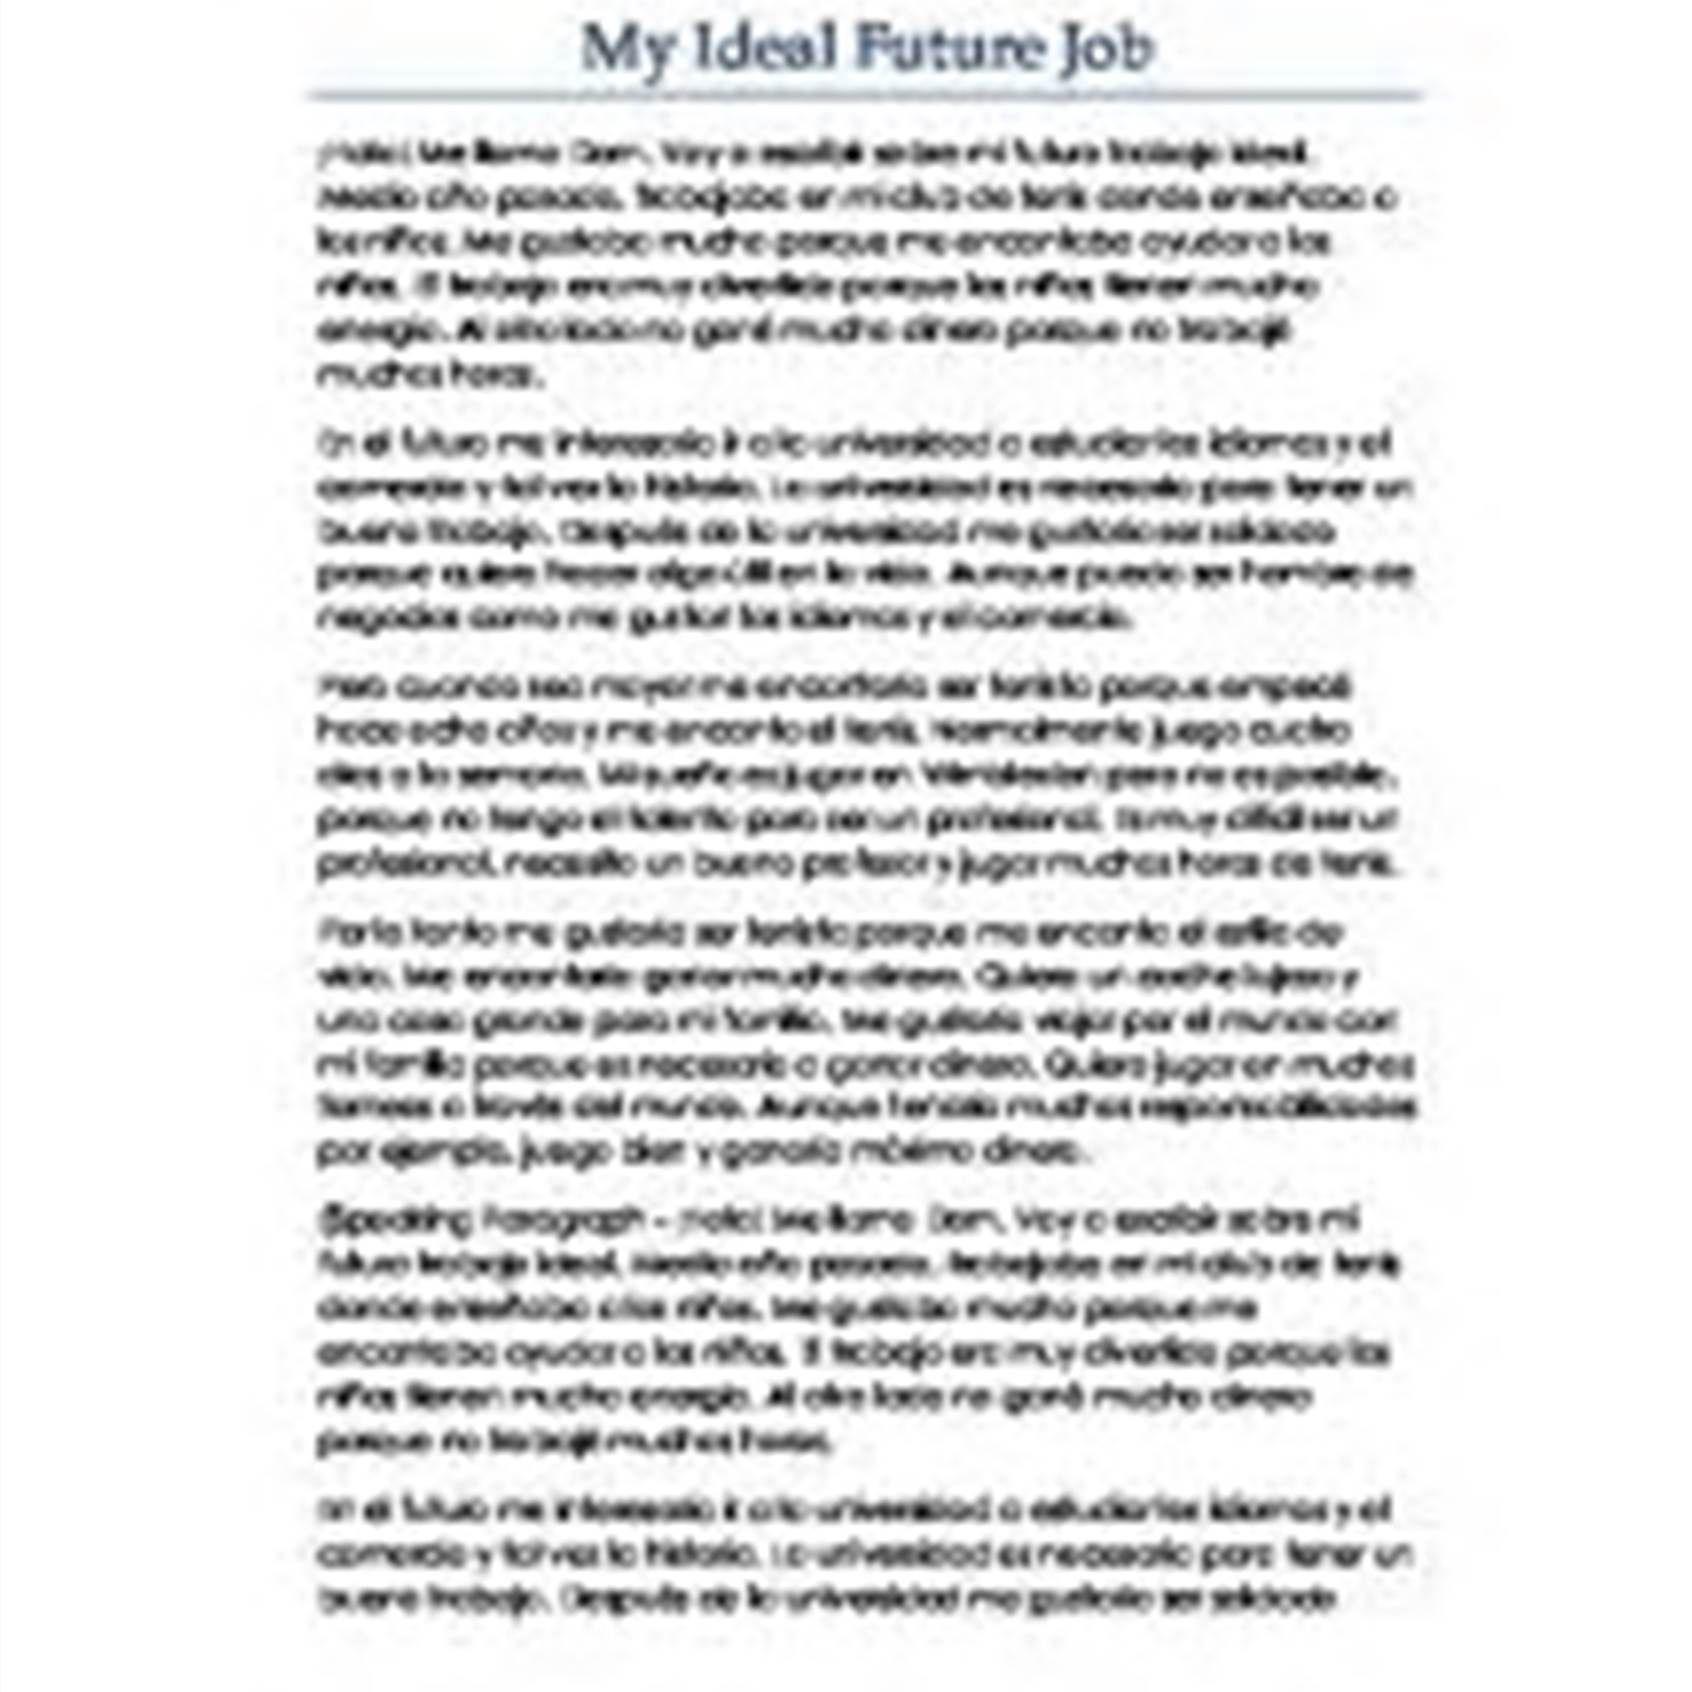 Sample Career Life Plan Worksheet